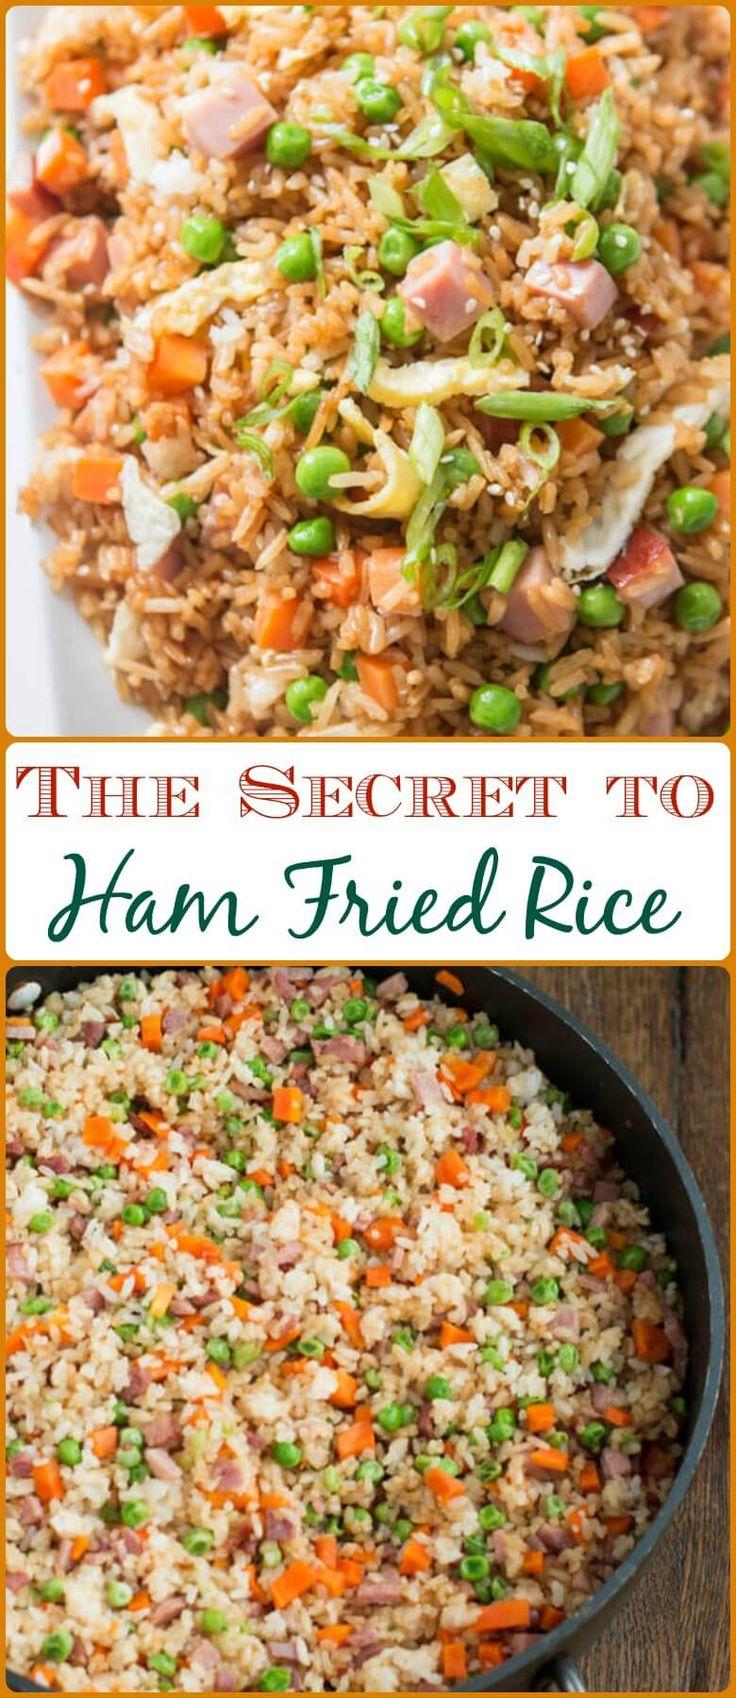 The Secret to Ham Fried Rice via @ohsweetbasil